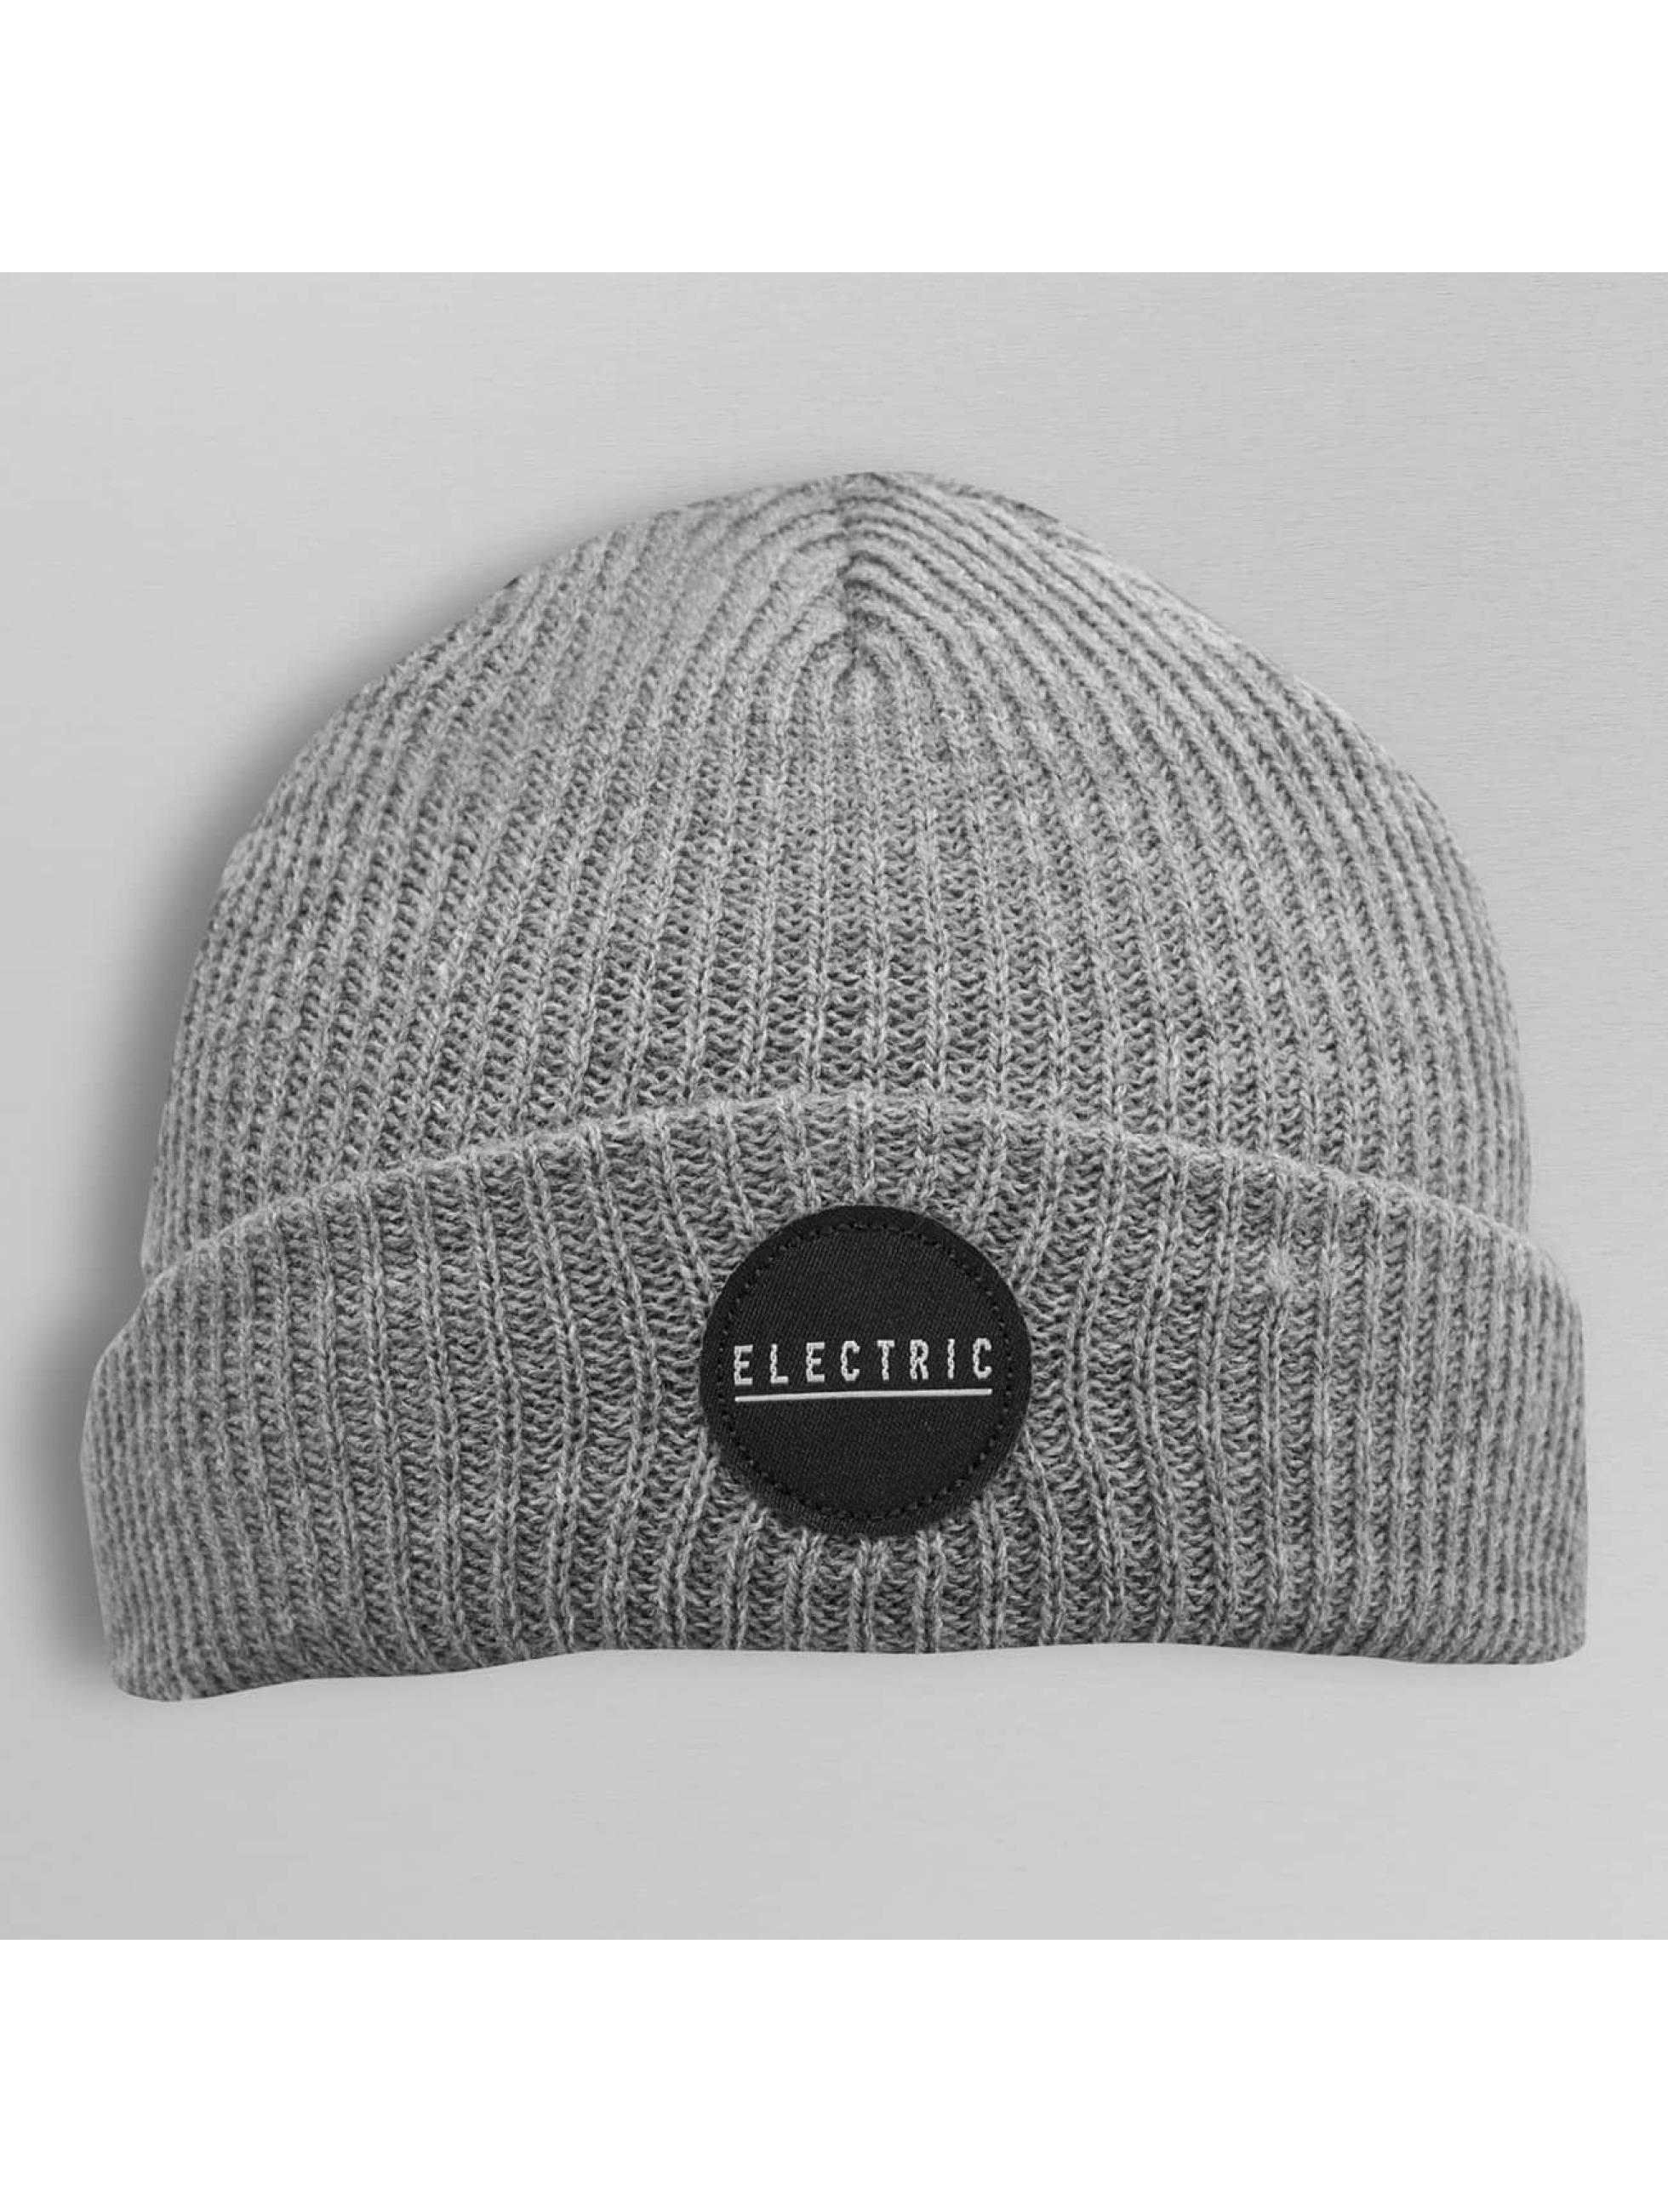 Electric шляпа RUBBER STAMP серый